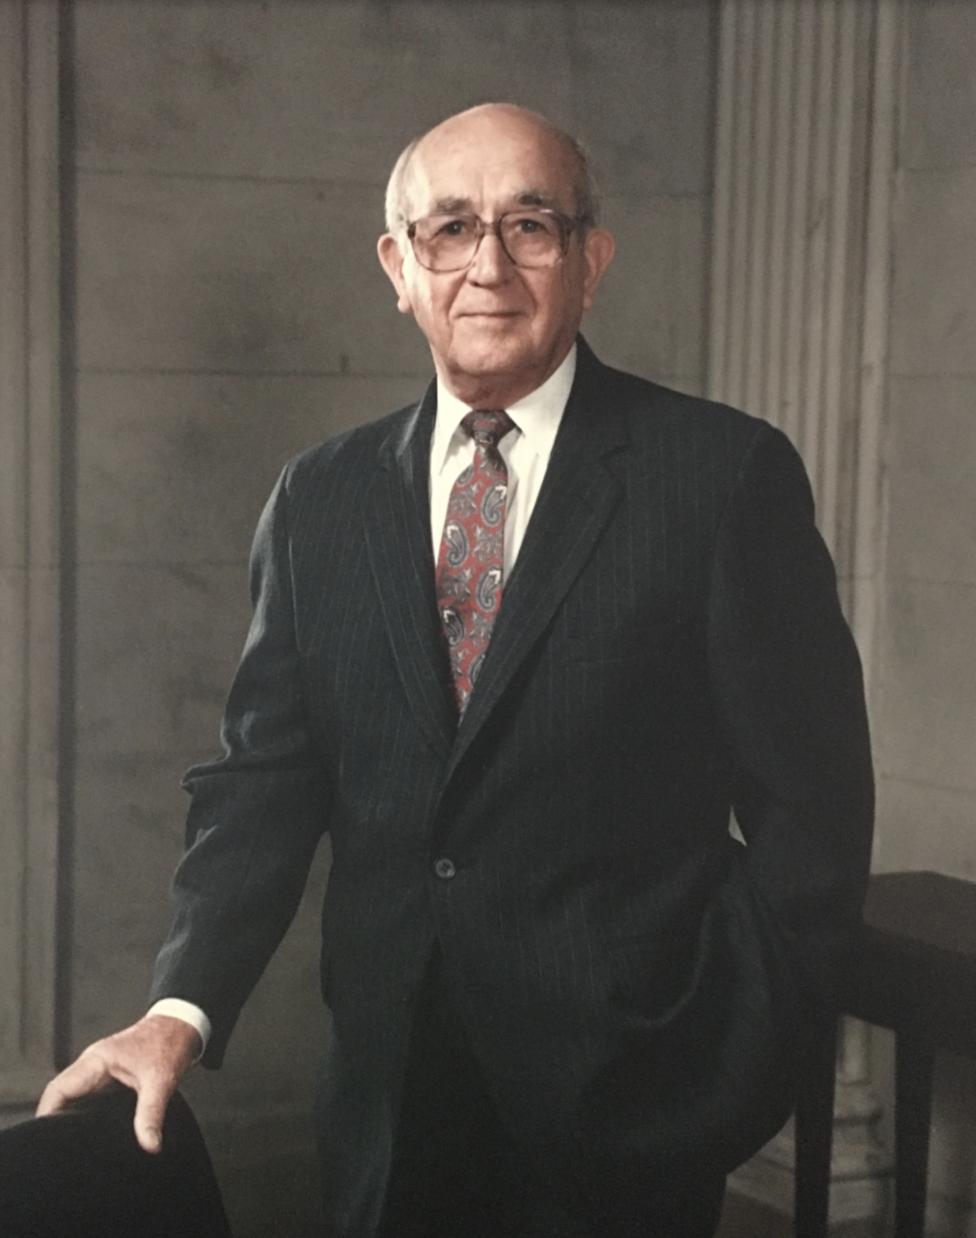 Ed Jones (U.S. politician) - Wikipedia